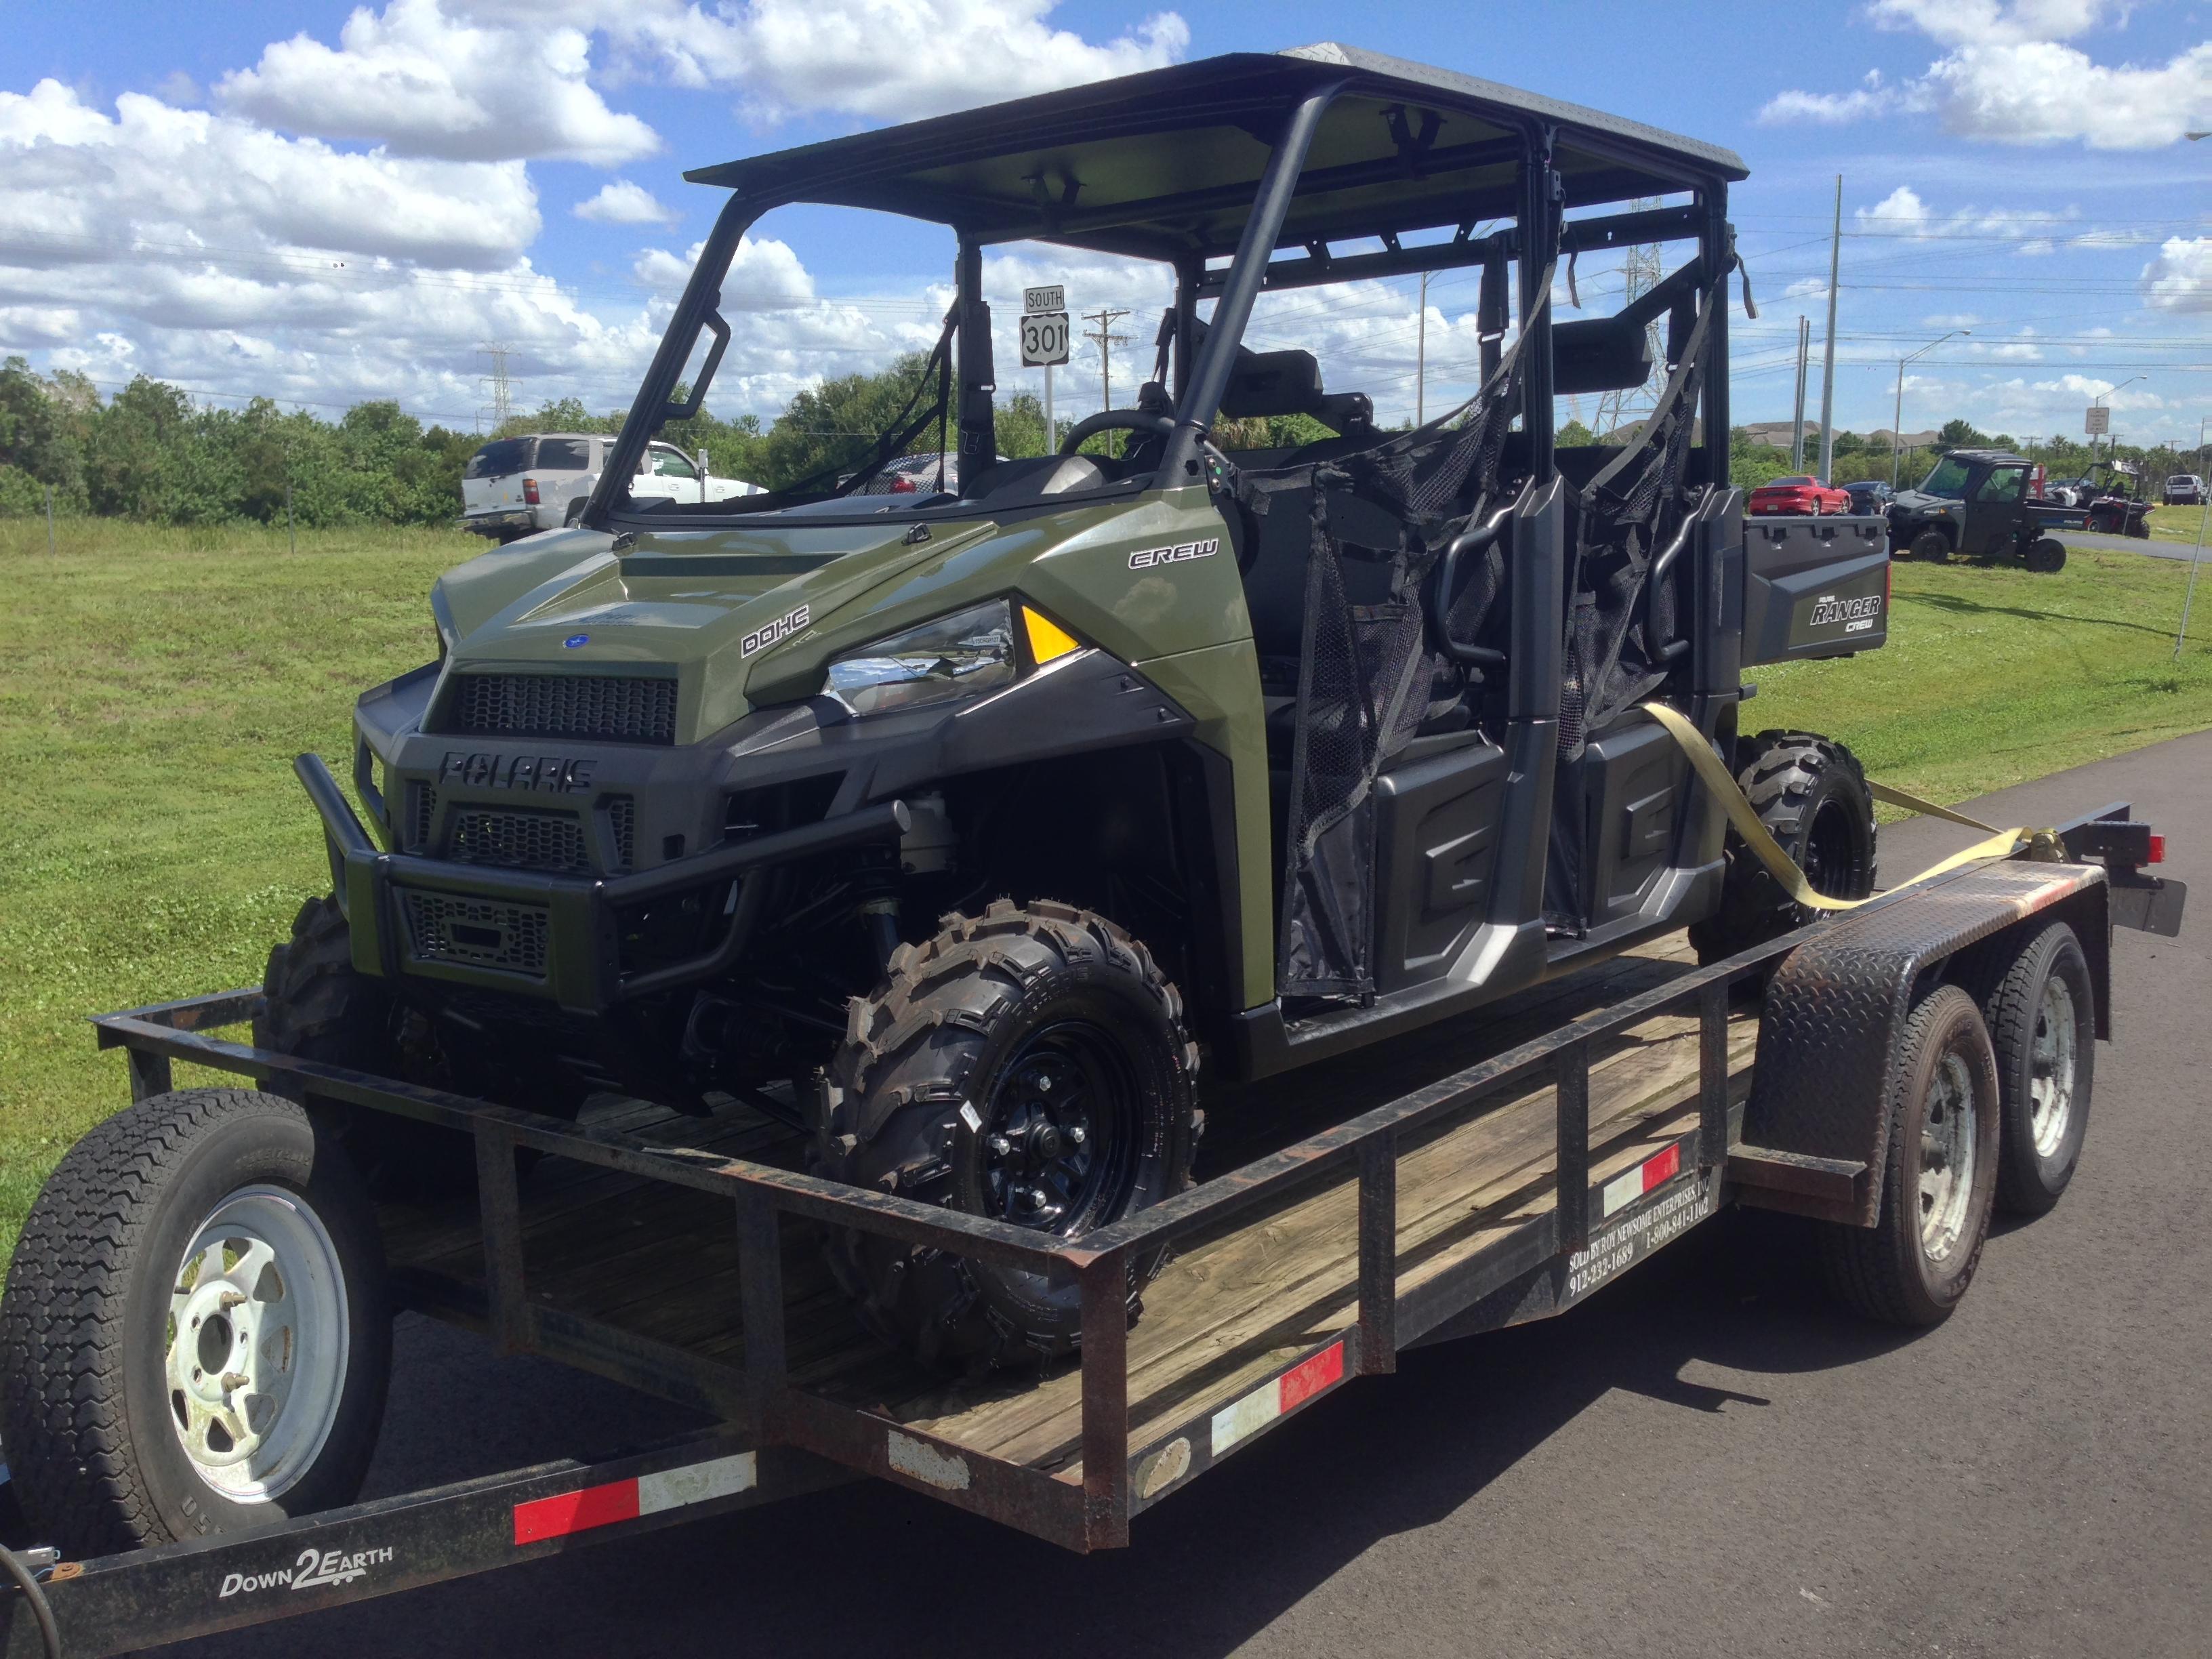 2015 Ranger Crew 570 Full Size Build Project